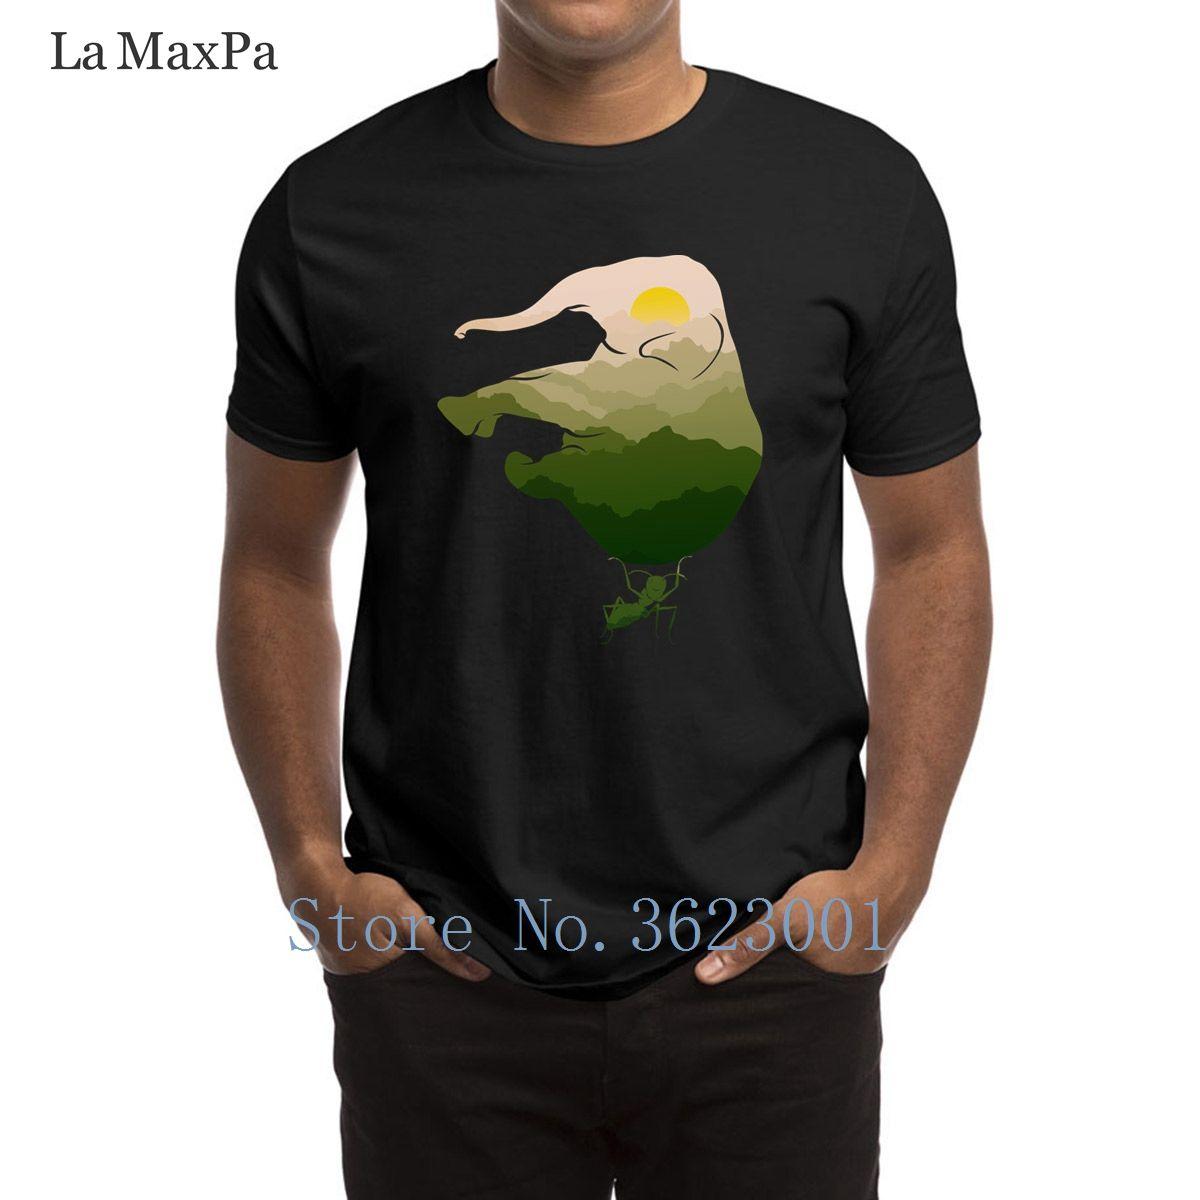 49aaee0264e1 ... printing novelty t shirt save elephant ant t shirt for men hilarious ...